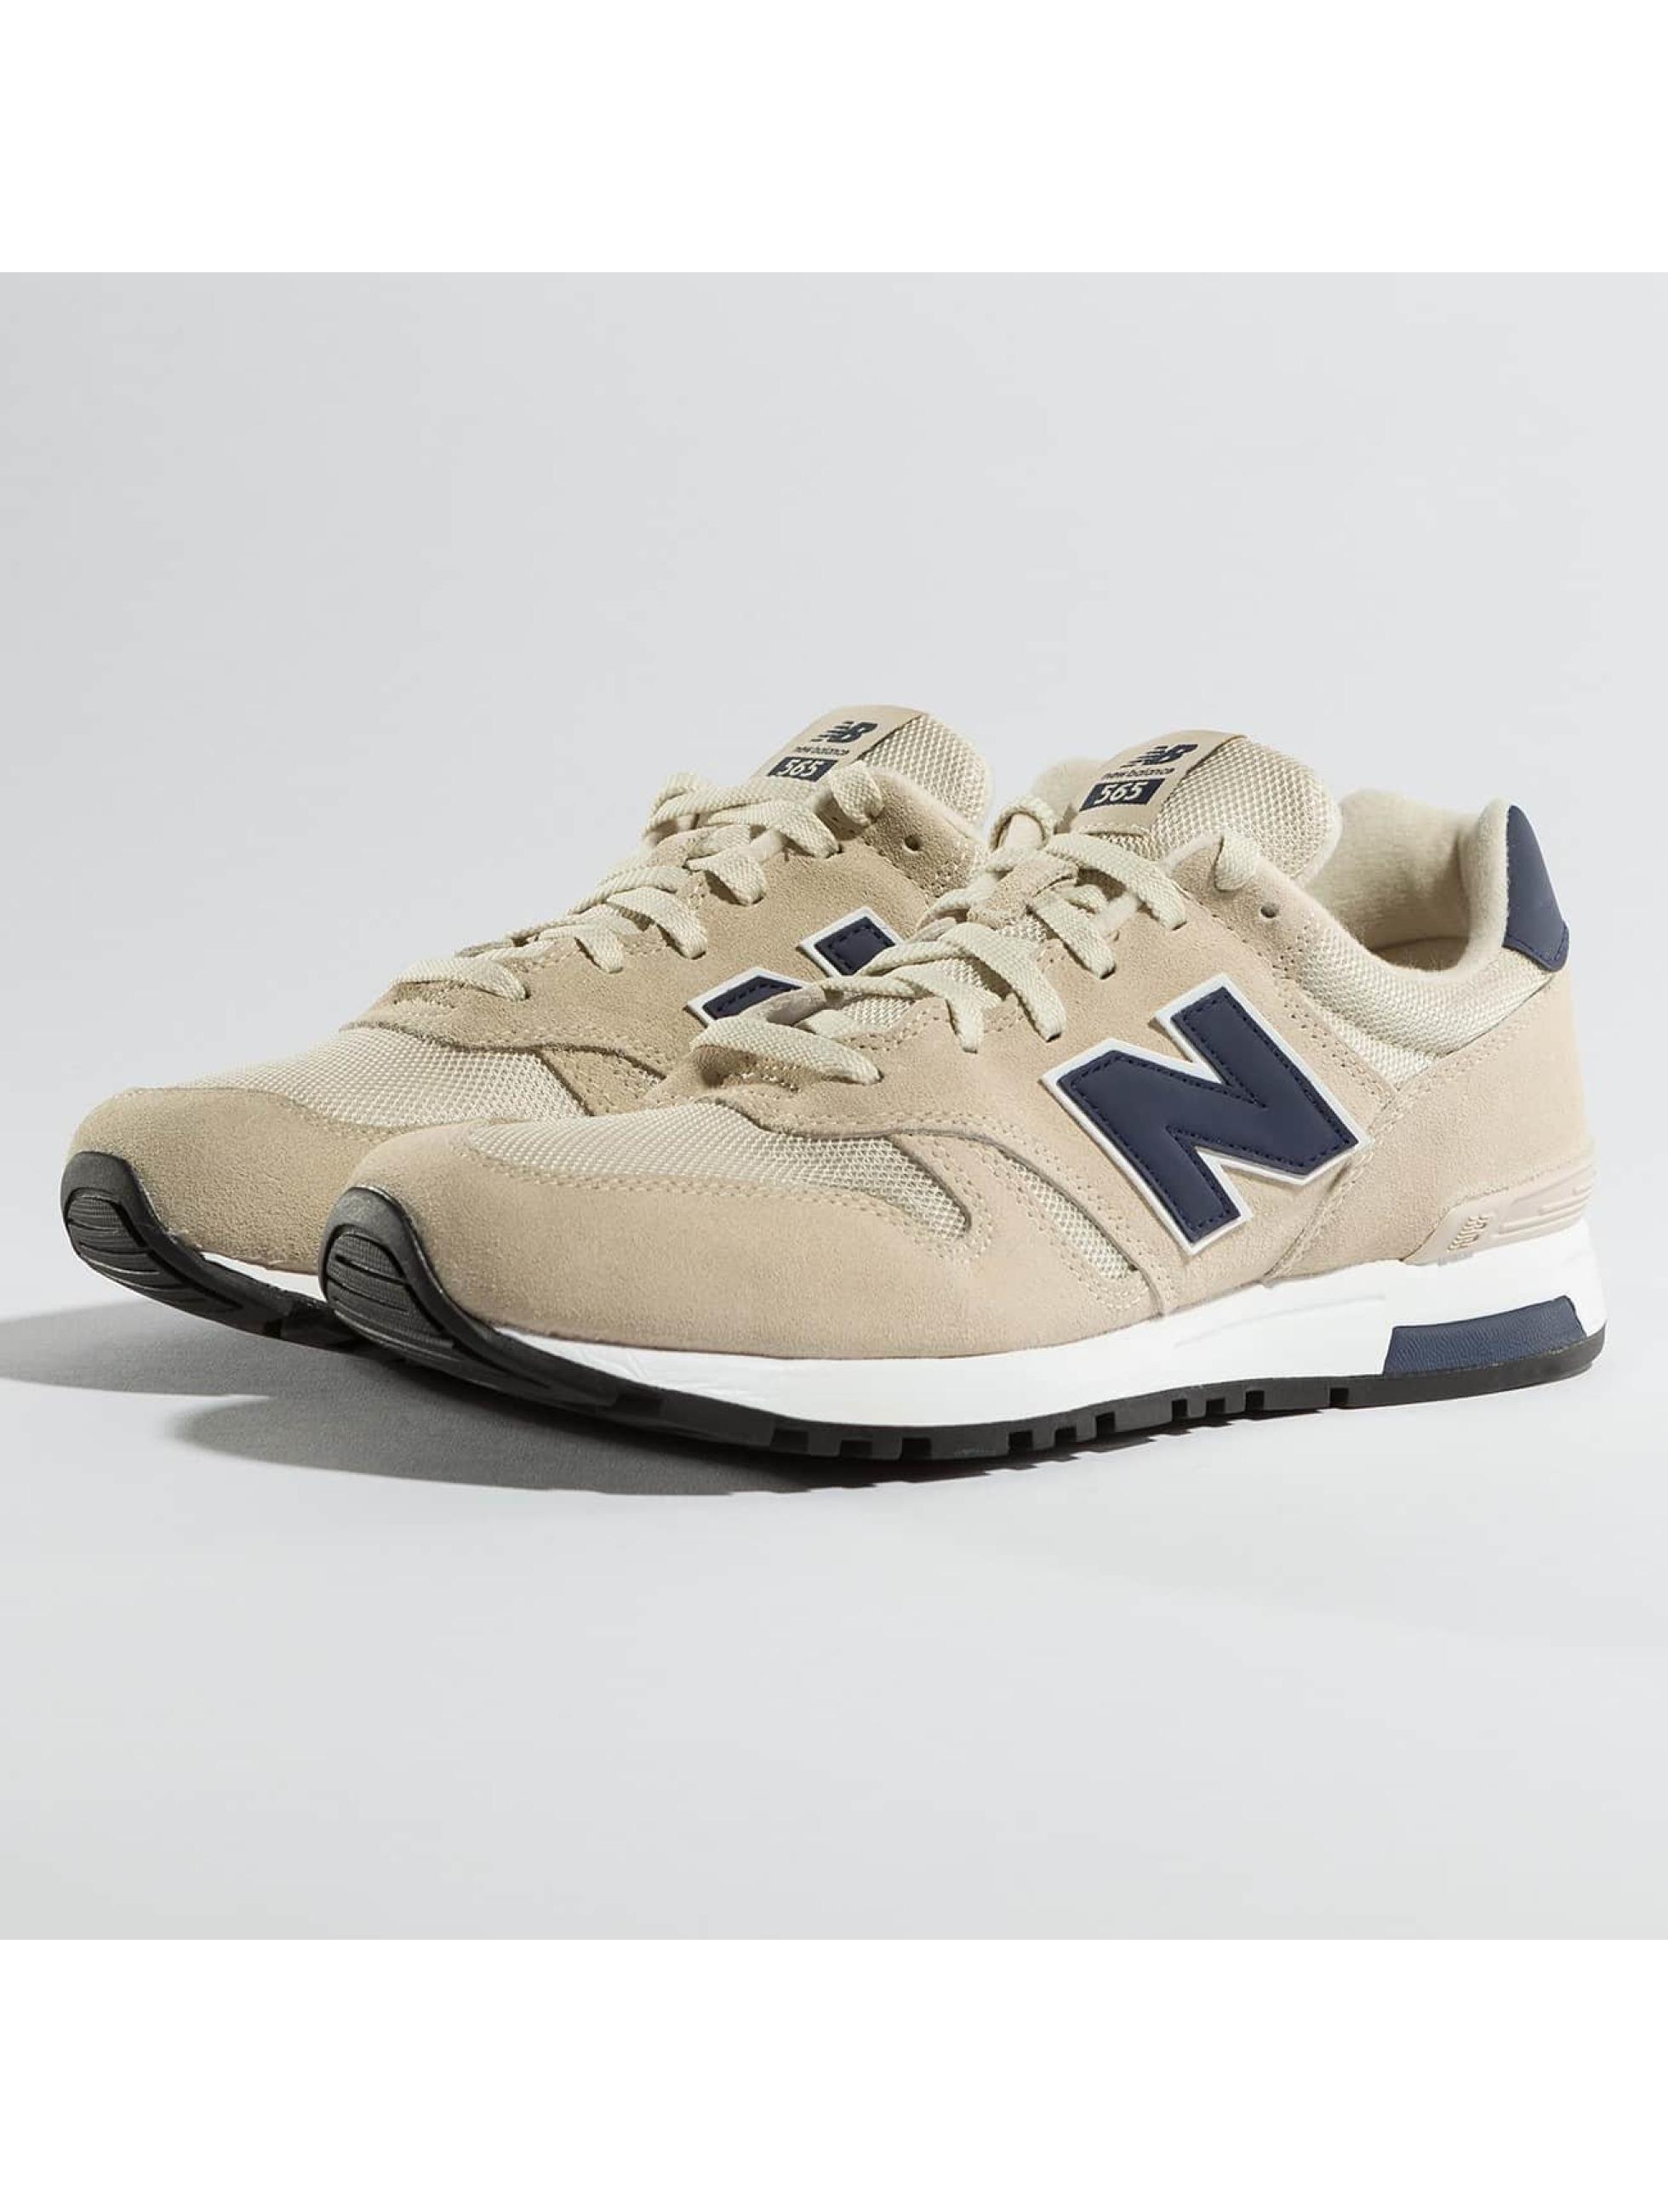 New Balance Männer Sneaker 565 80s Running in beige